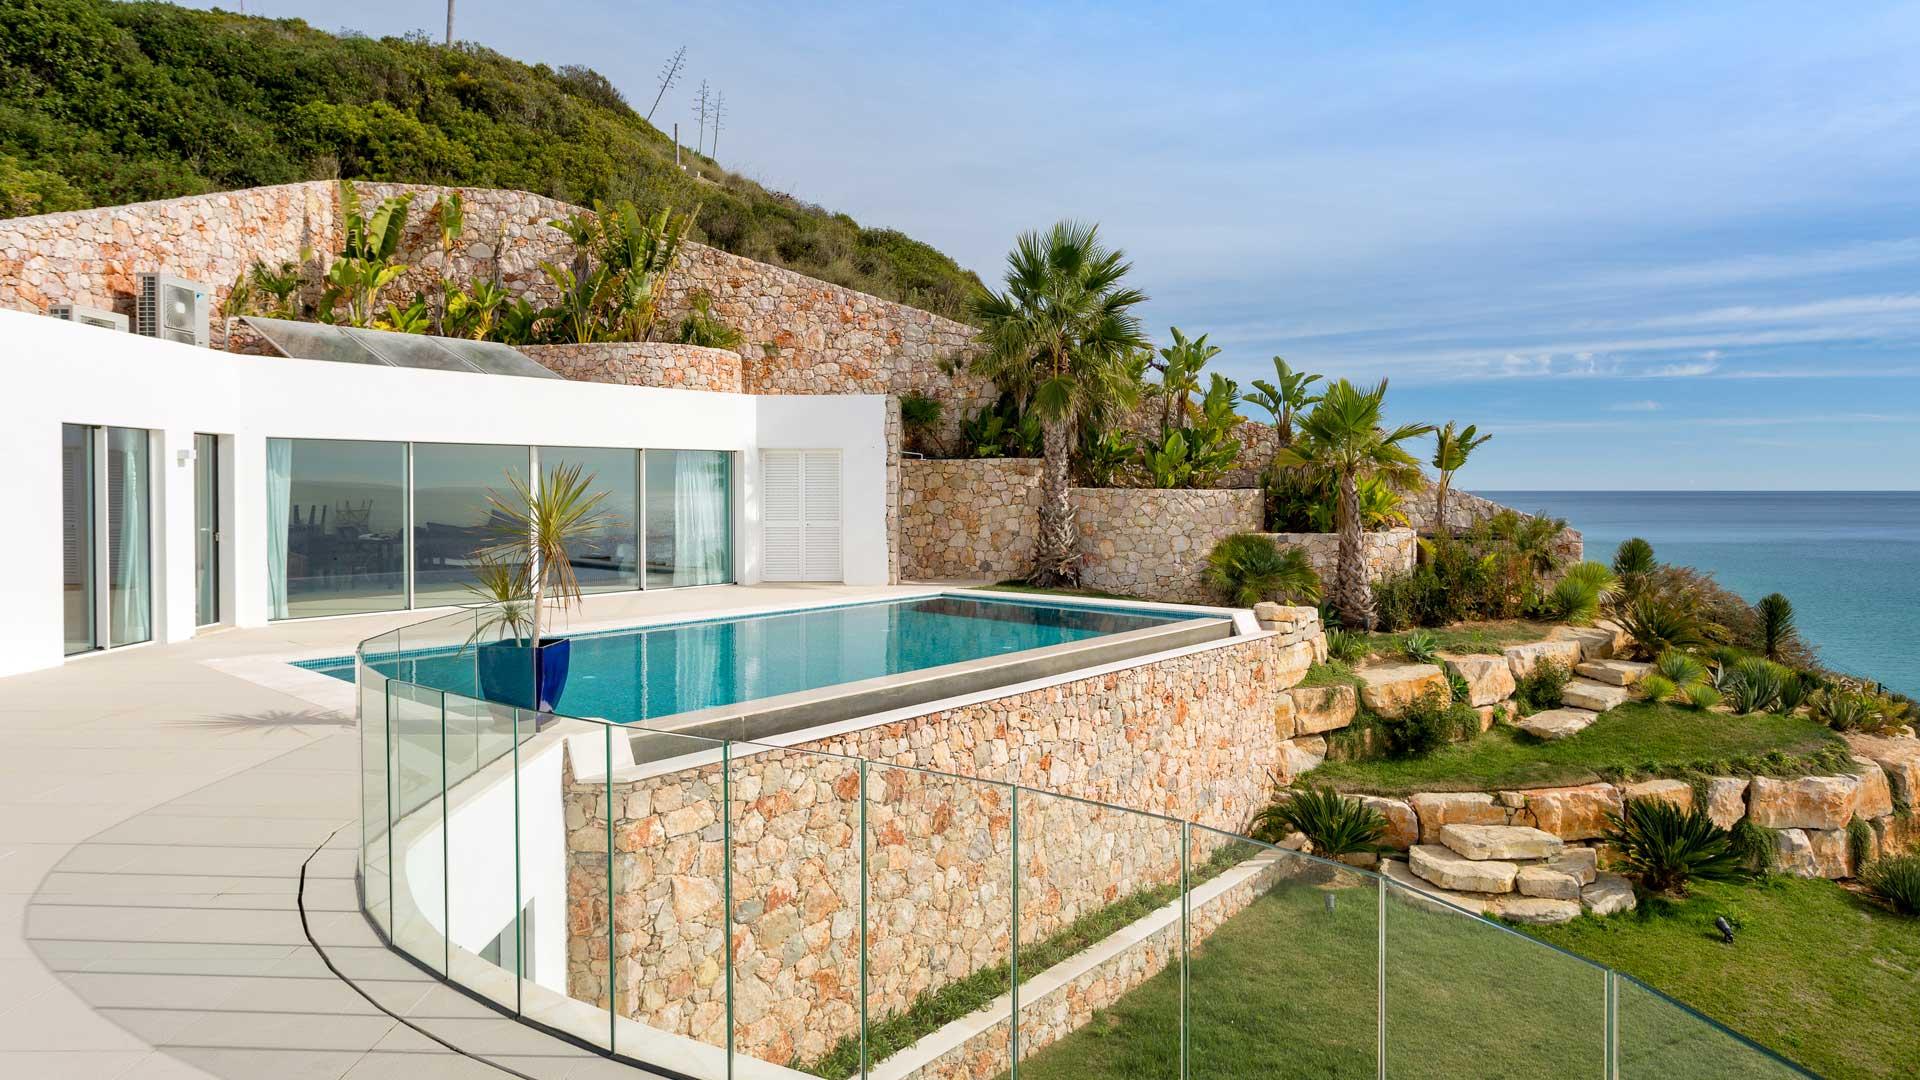 Location Villa De Luxe Algarve Portugal: Le Top pour Location Maison Portugal Piscine